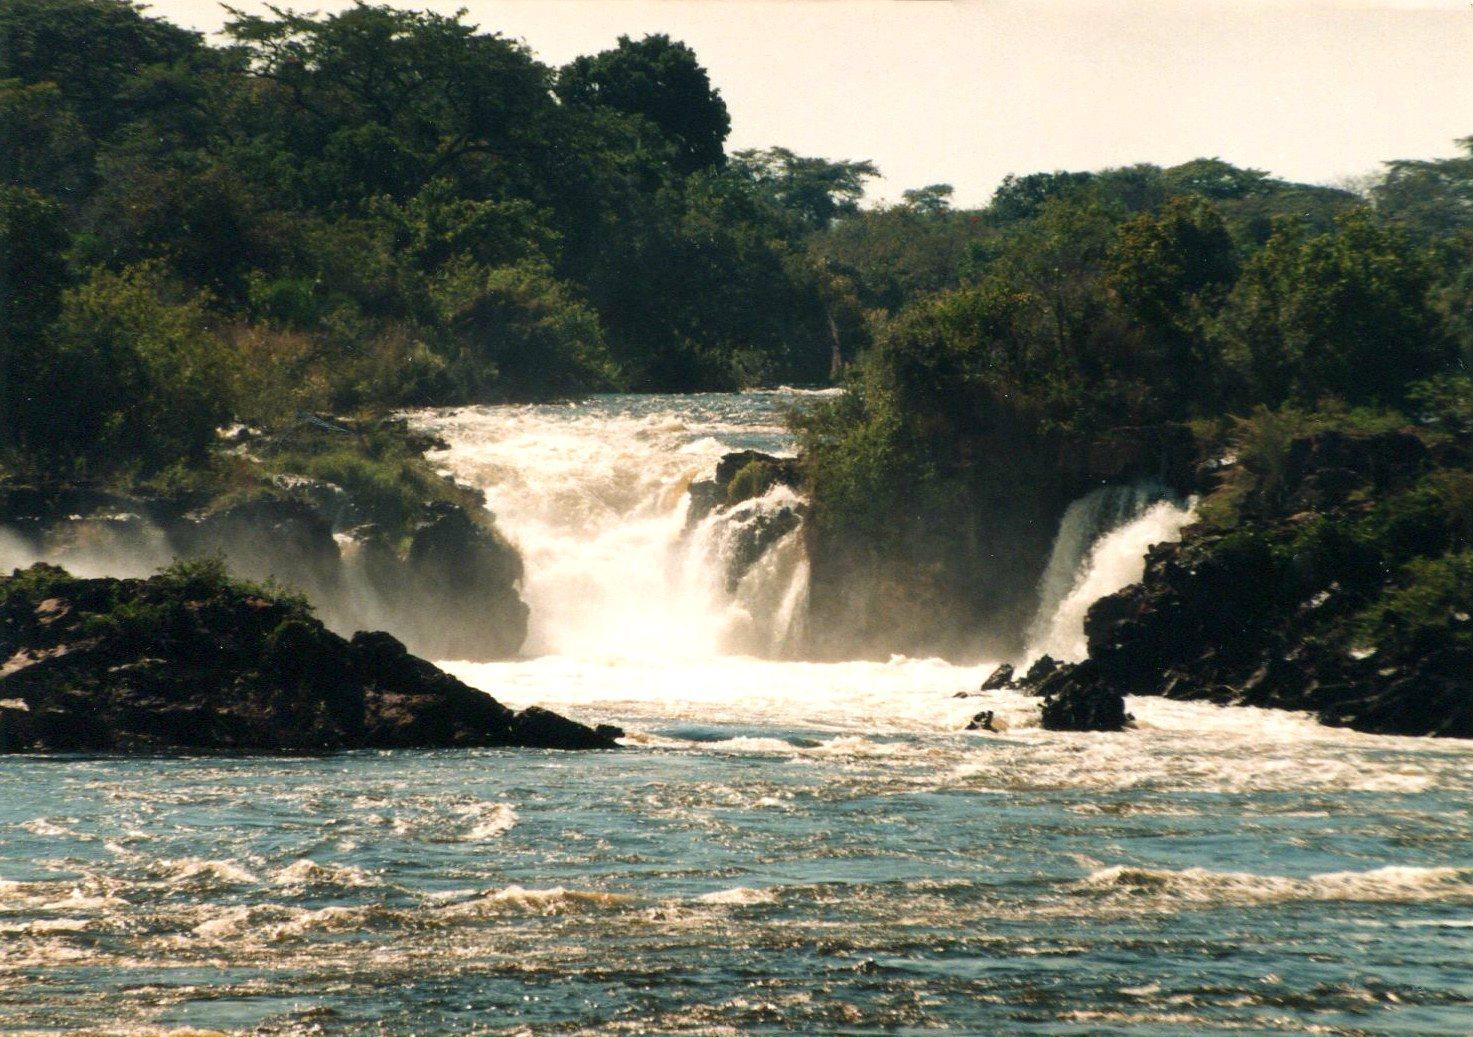 Vodopády Ngonye, Zambezi, Zambie